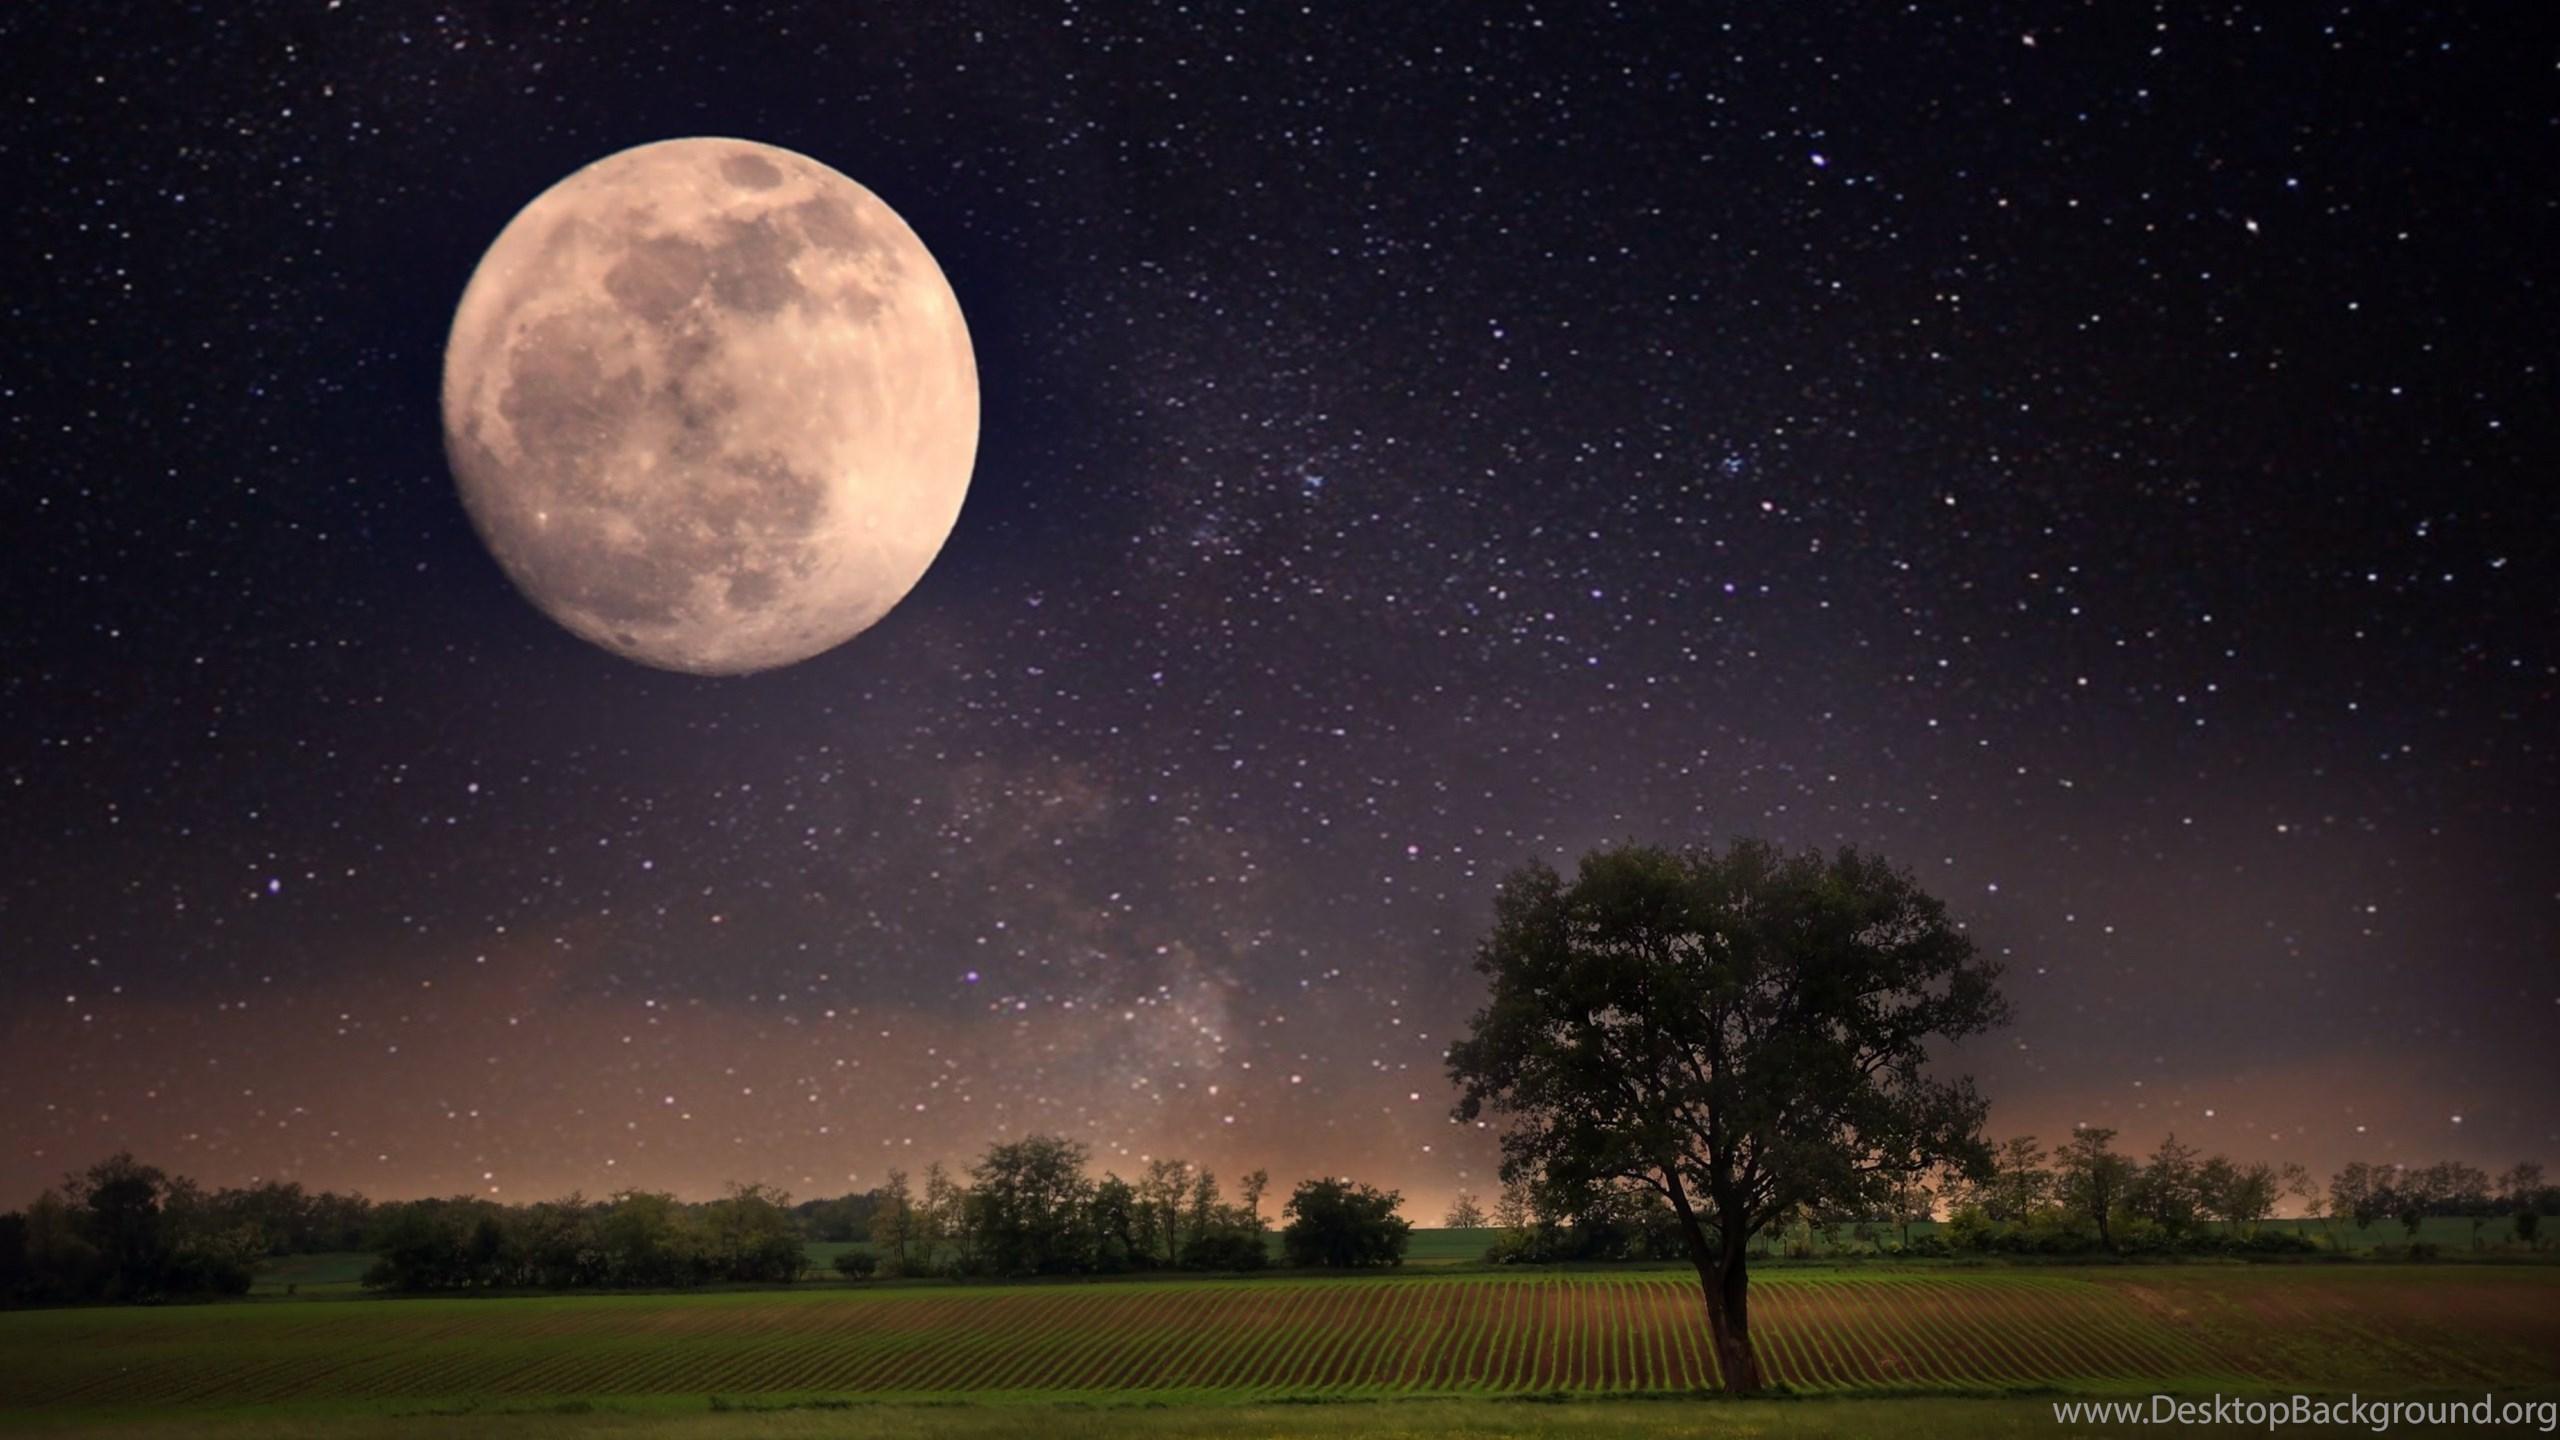 Moon Night Scene Wallpapers 4k 4096x2160 Resolution Wallpapers